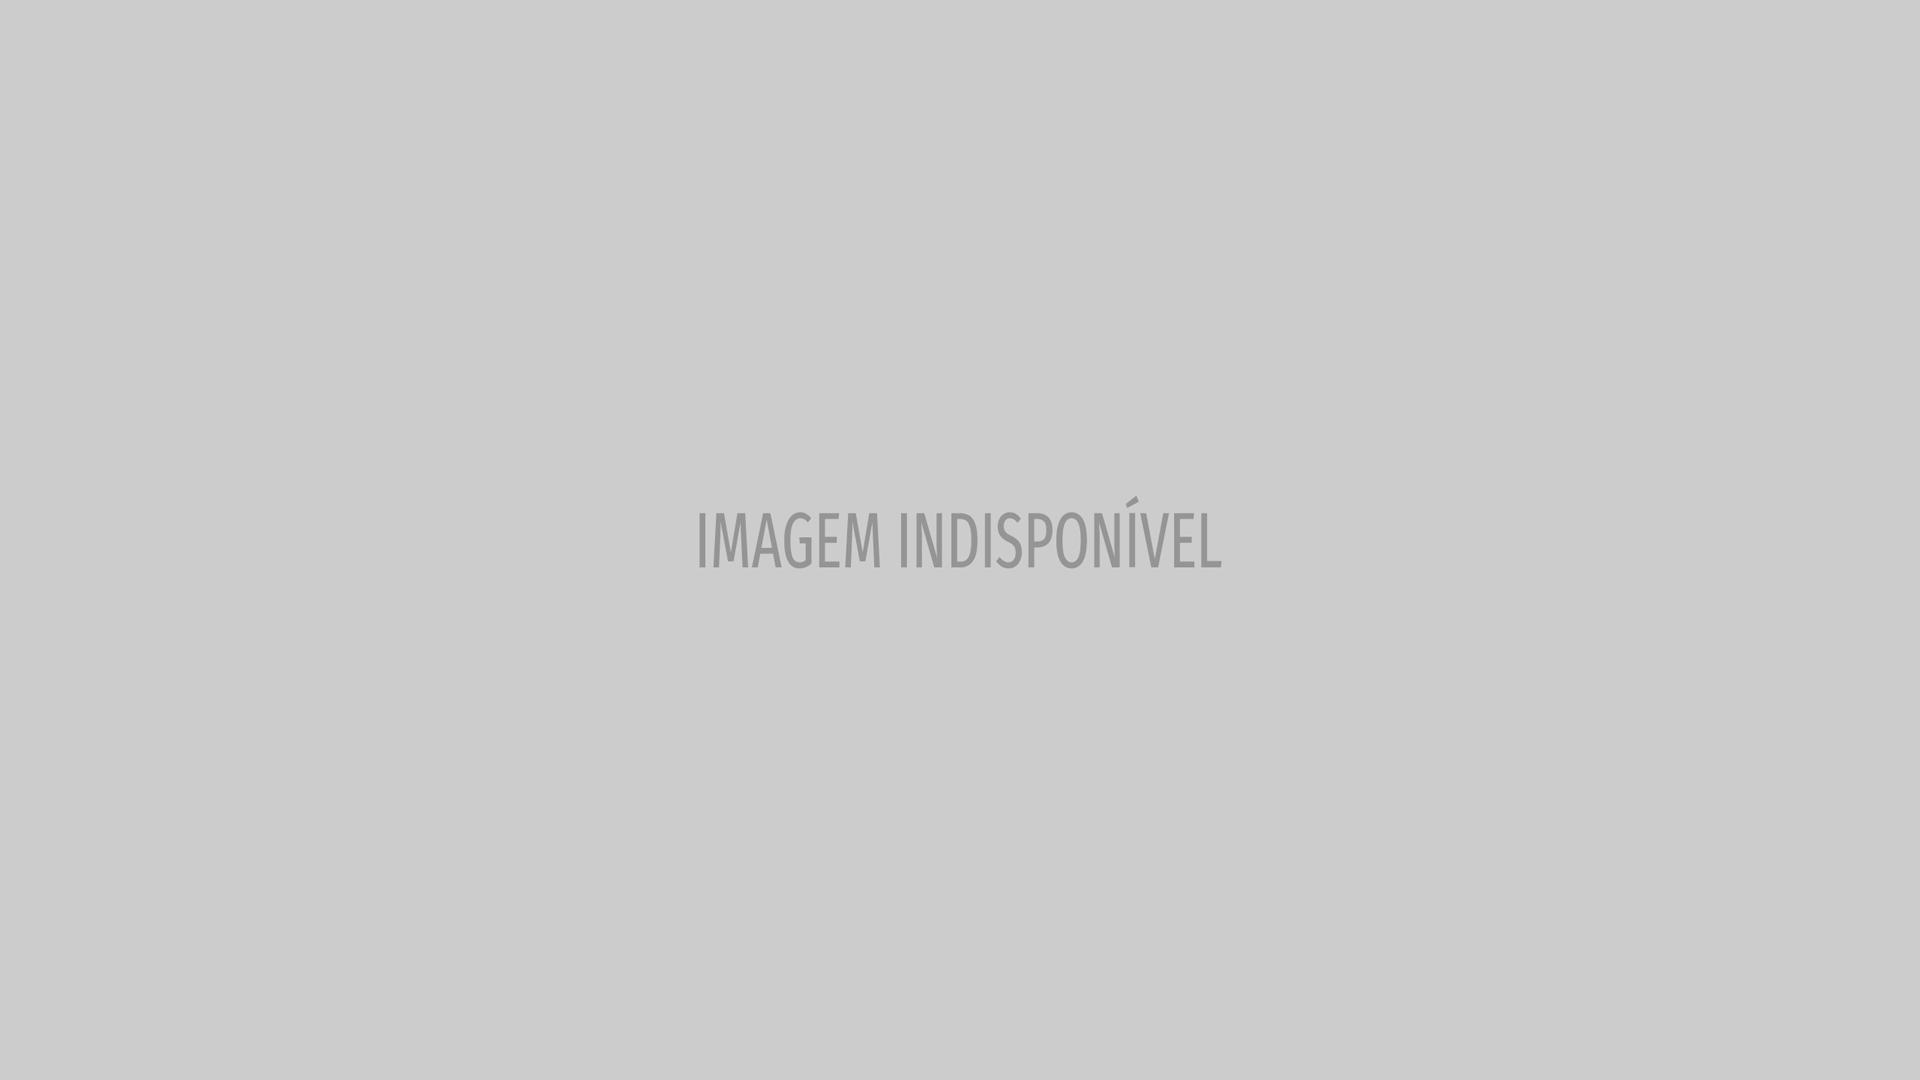 Marina Ruy Barbosa edita e se desculpa em post de papel higiênico preto